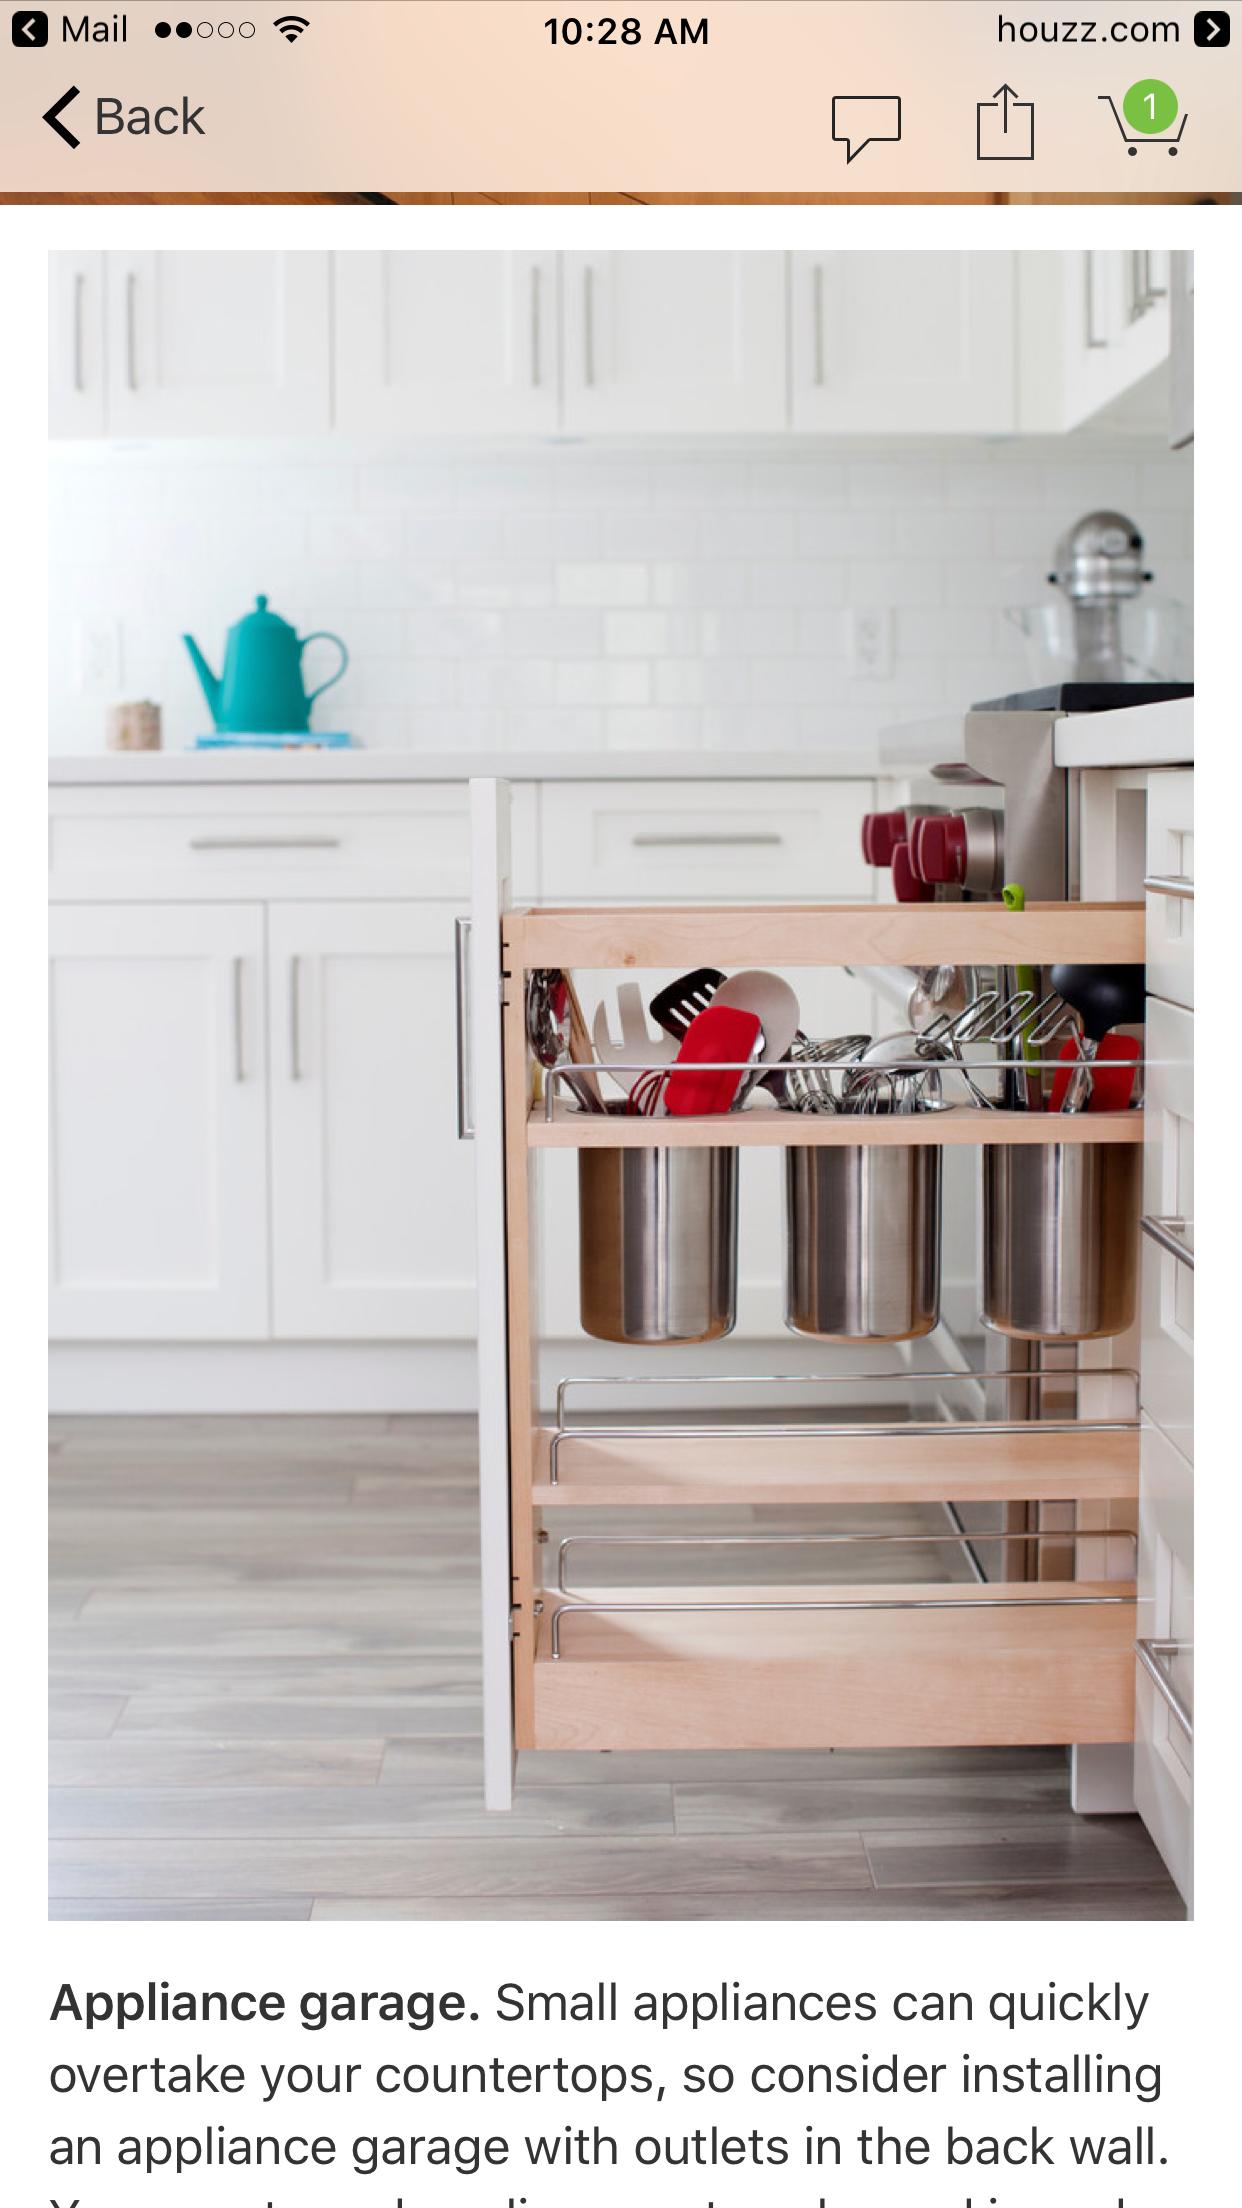 Idea by Diana Verne on kitchen remodel Kitchen remodel